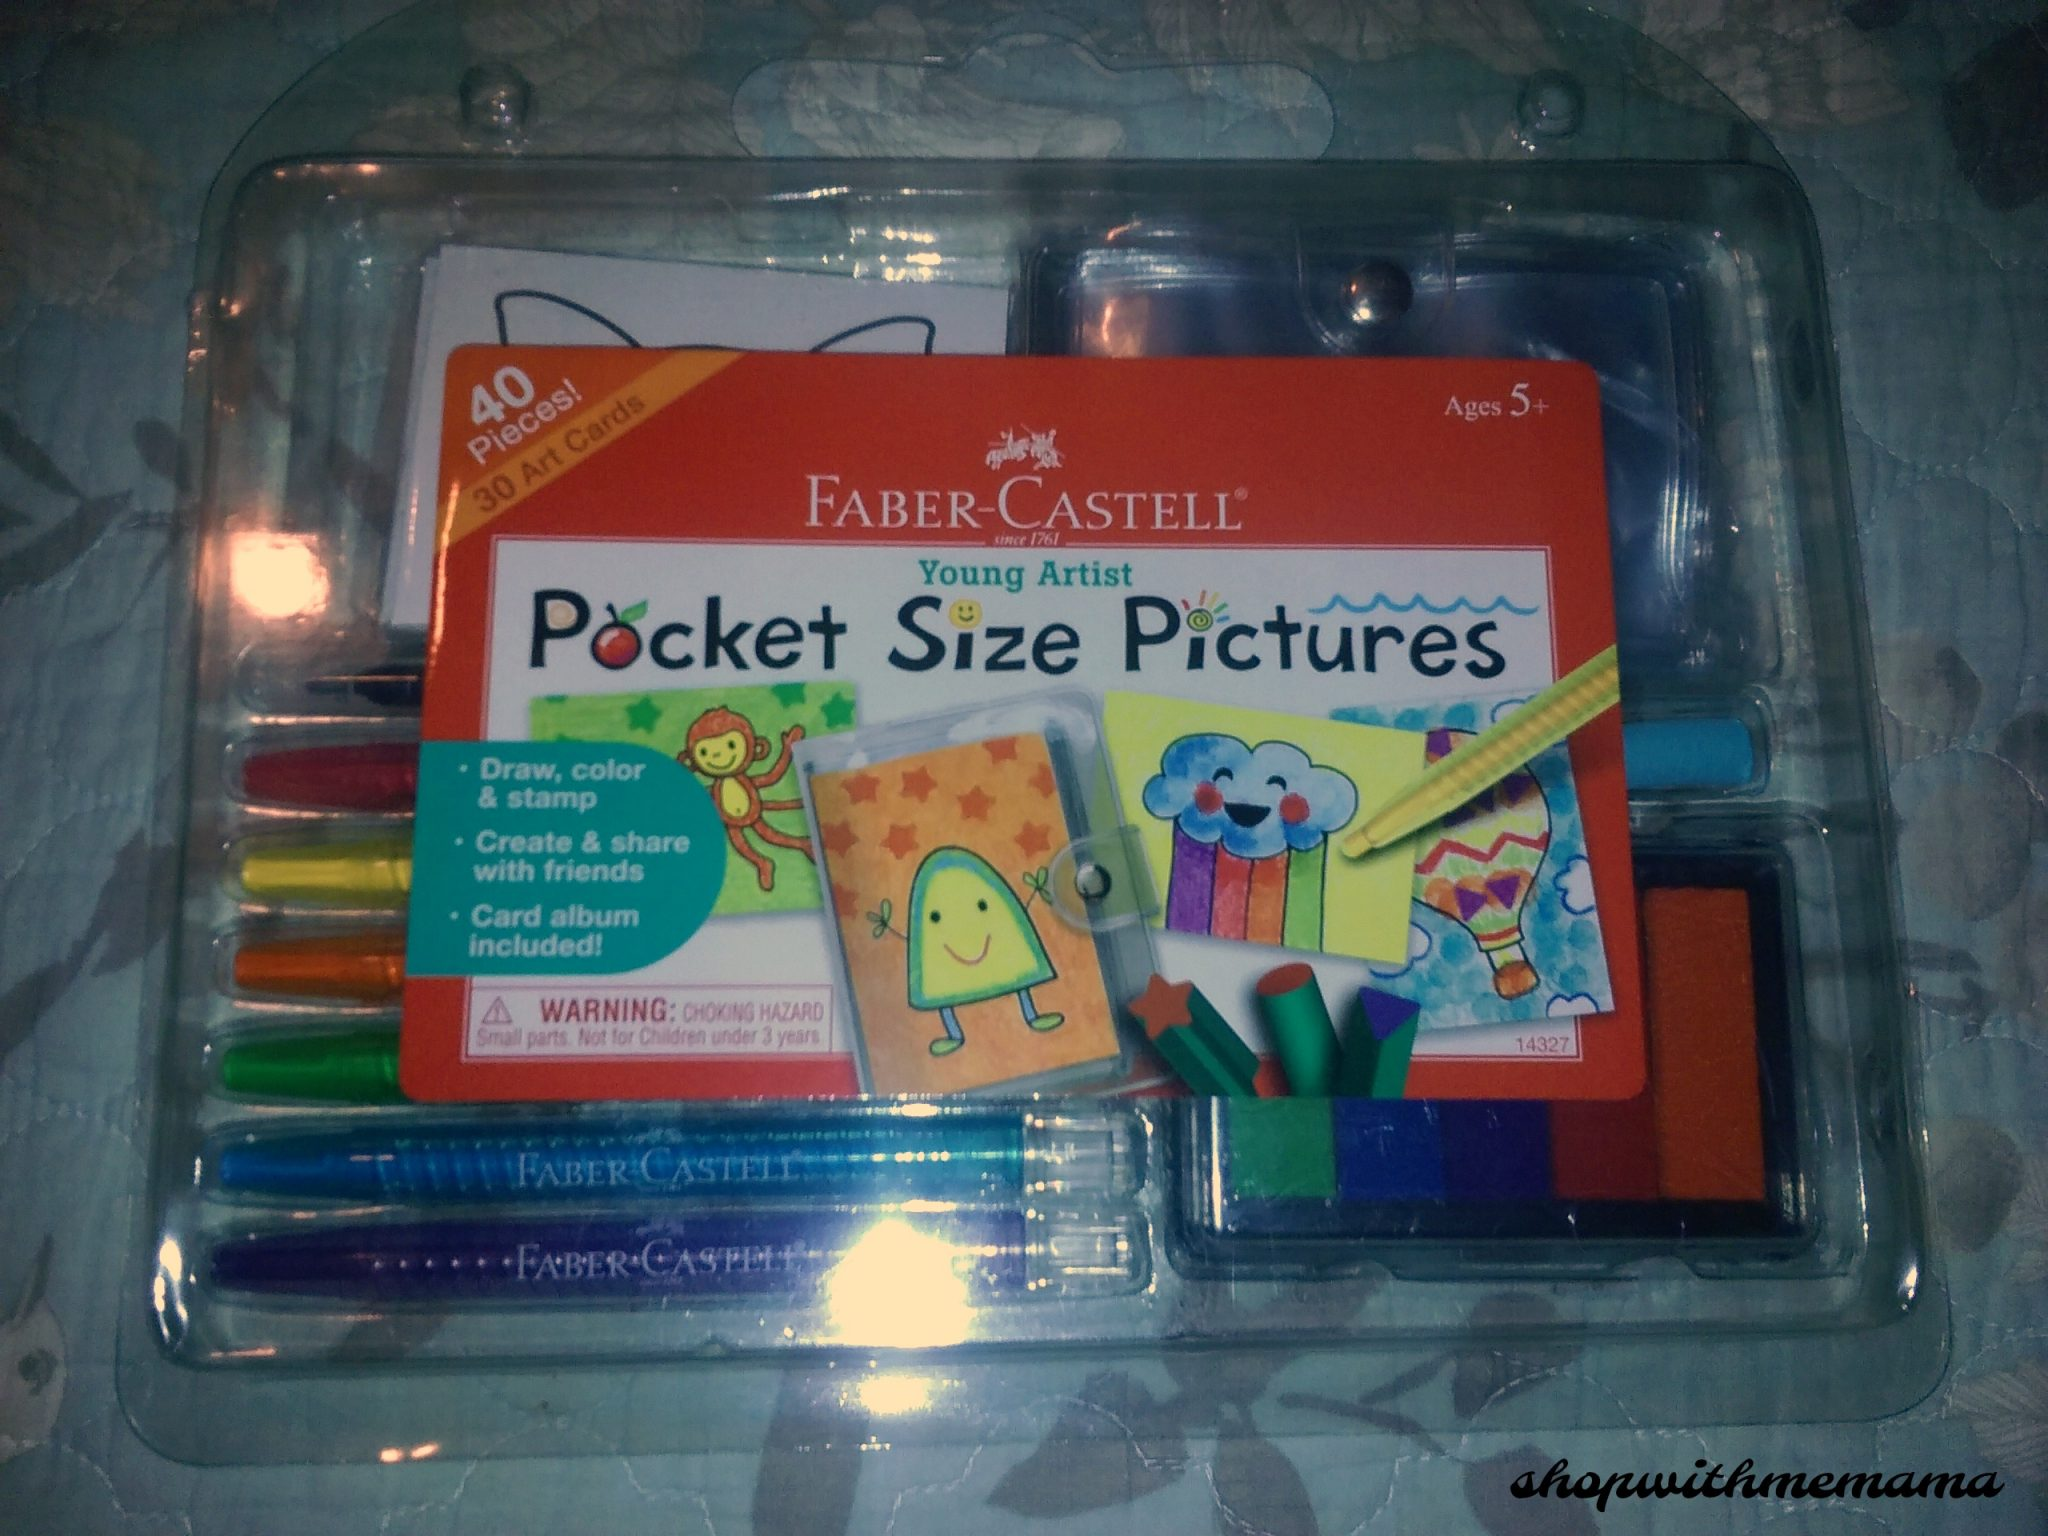 Faber-Castell Premium Children's Art Products